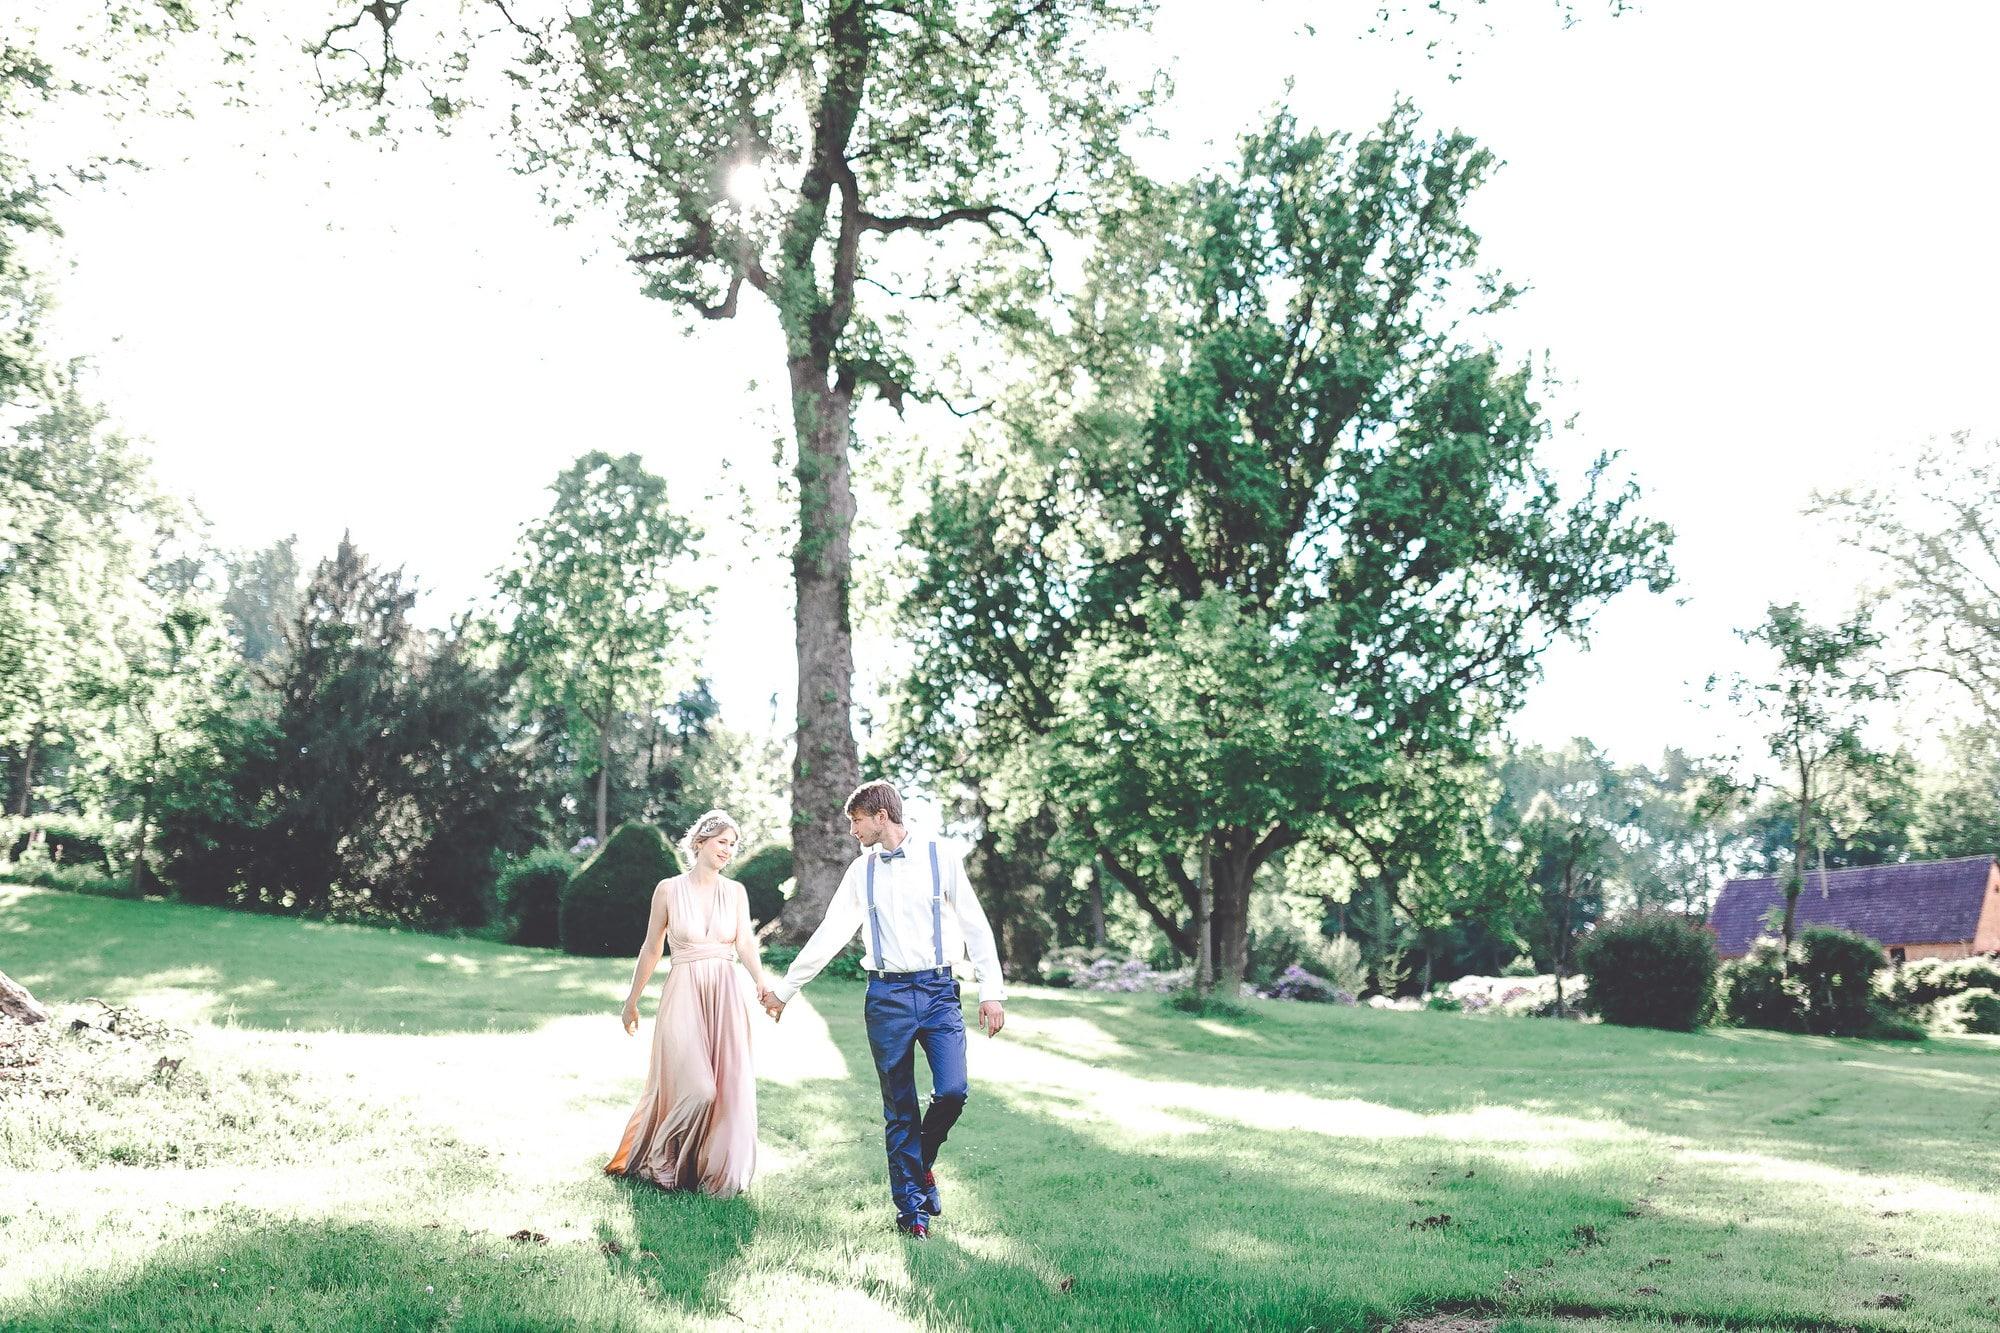 Paarshooting Wiese Bäume Sträucher Kleid Mann Frau